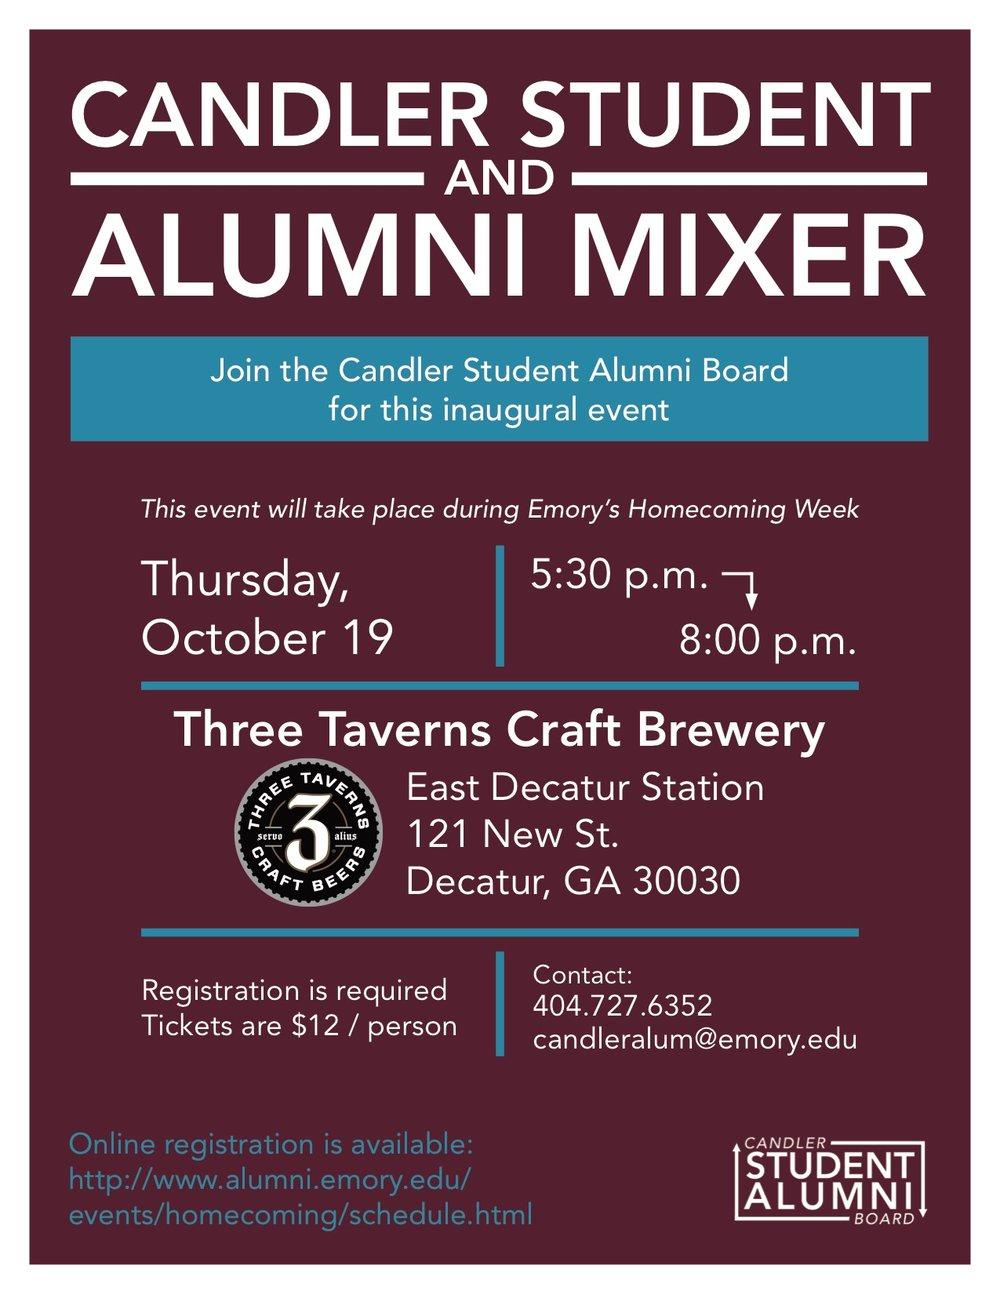 Student Alumni Mixer Flyer.jpg